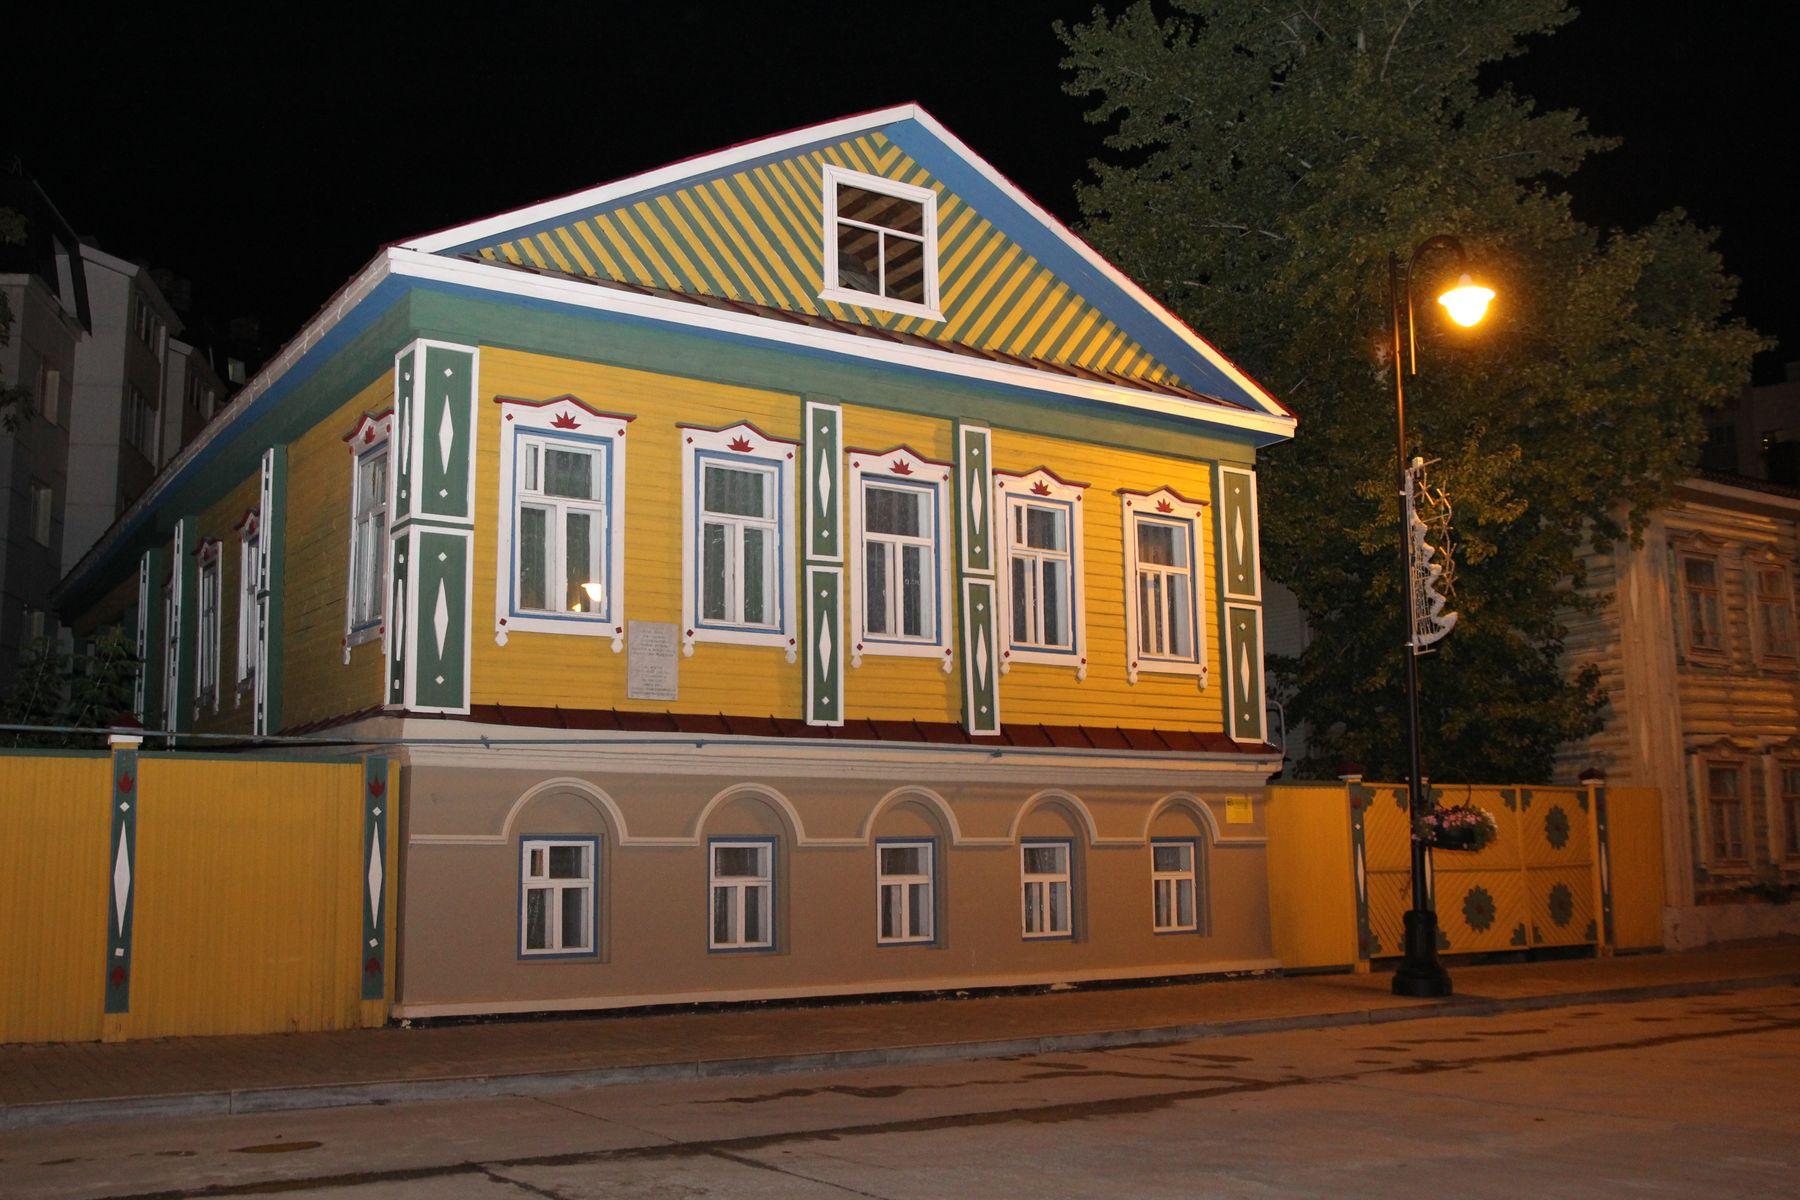 Дом известного татарского богослово-историка Шигабутдина Марджани  (1818-1889).  Казань, Старотатарская слобода